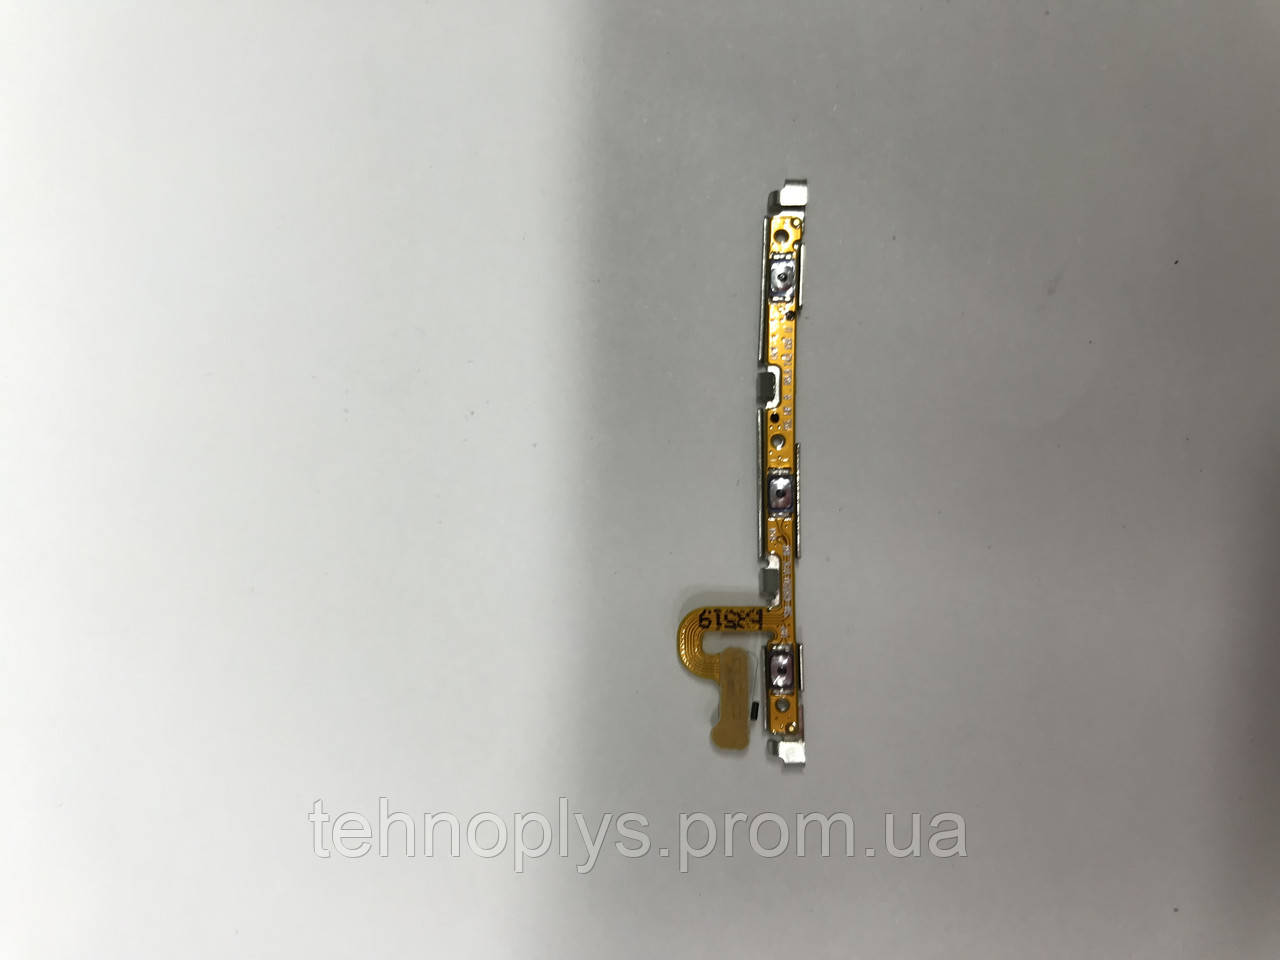 Шлейф кнопок звука Samsung G950F Galaxy S8, G955 Galaxy S8 plus, N950F Galaxy Note 8